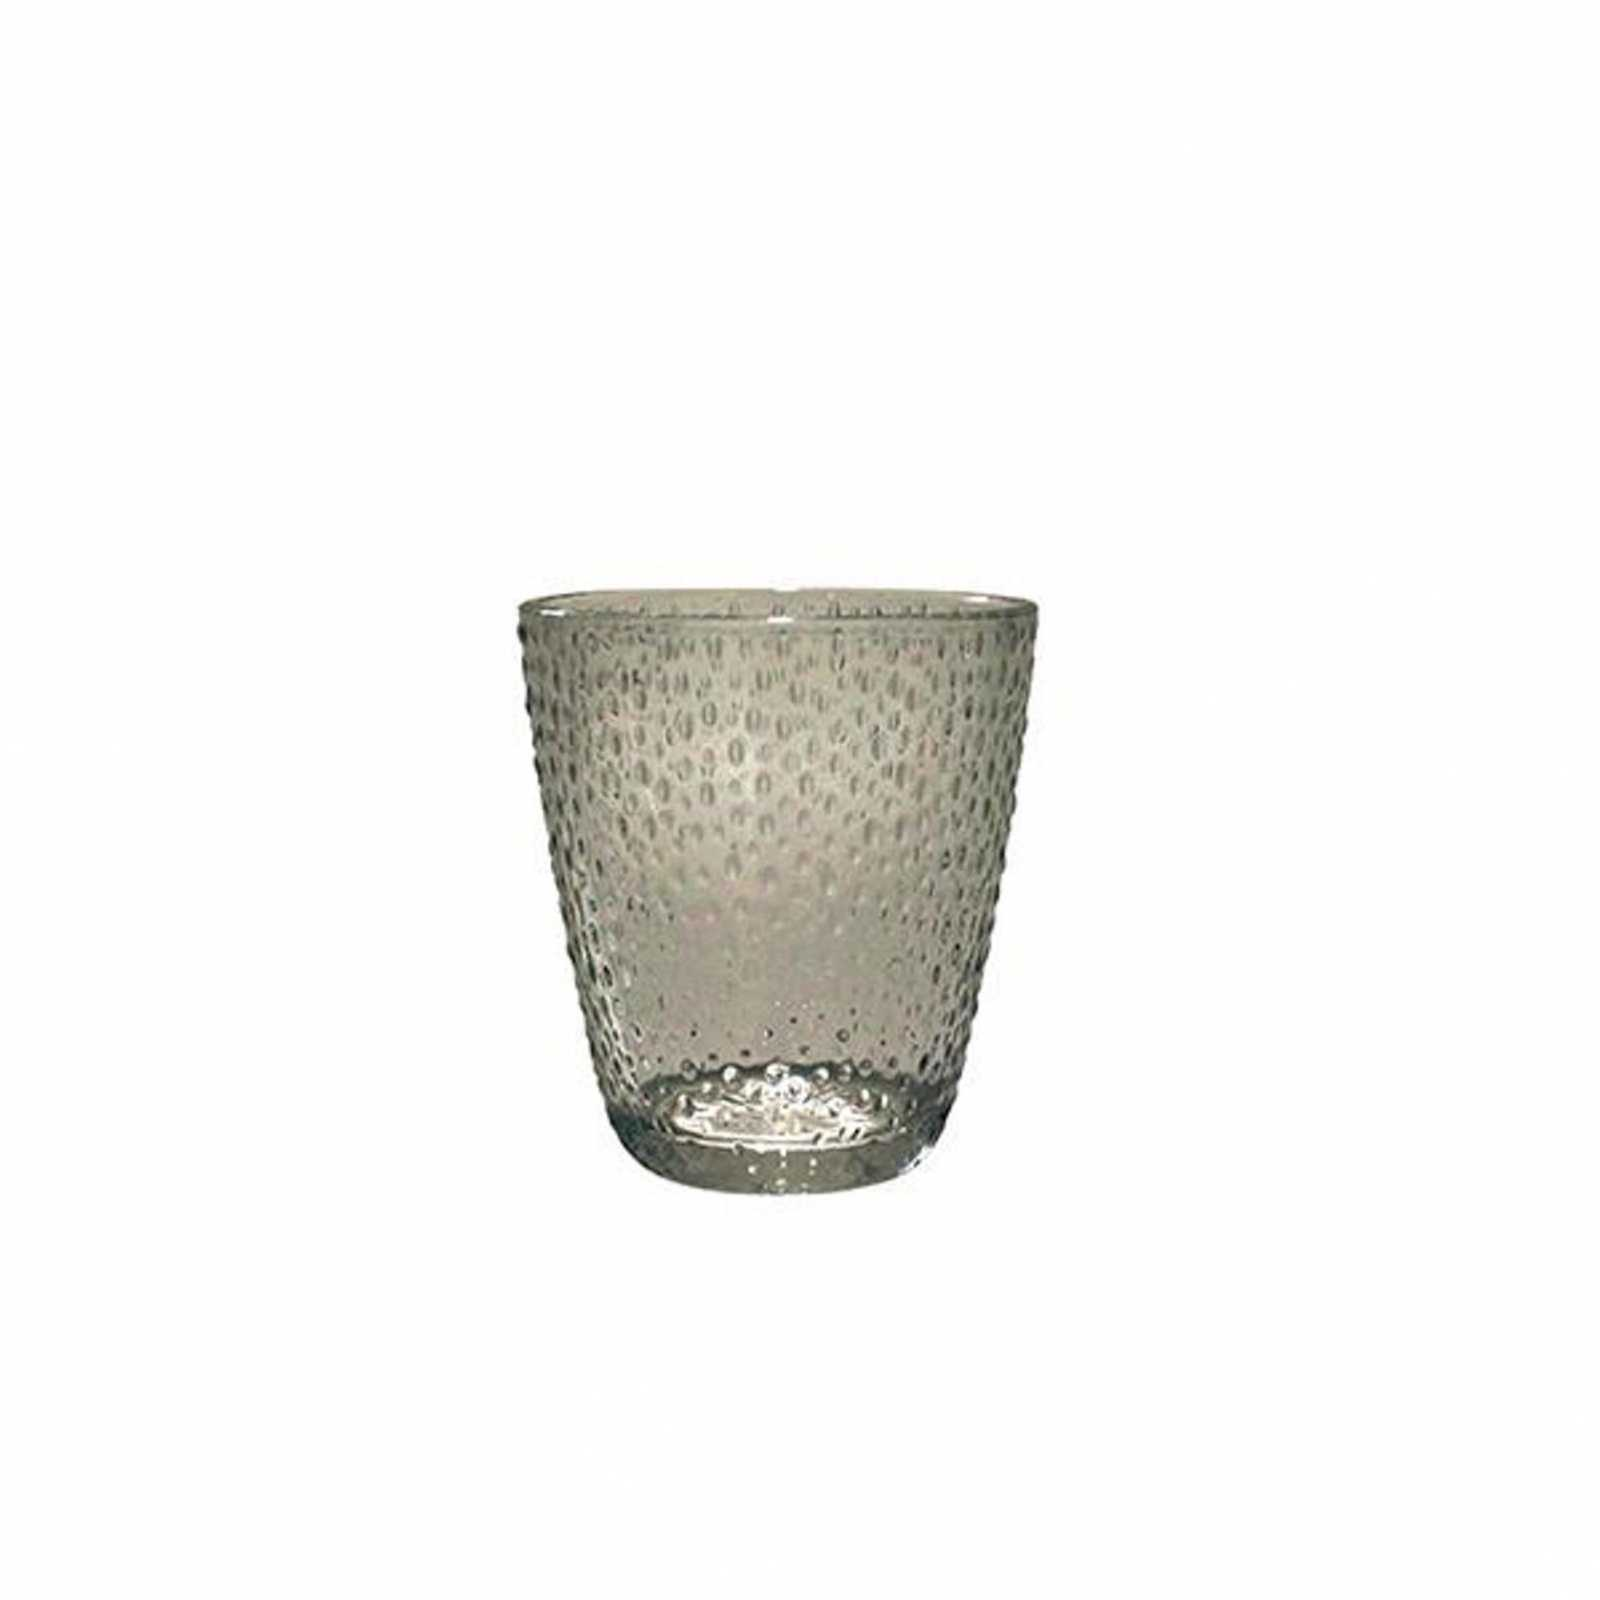 Онлайн каталог PROMENU: Стакан Aida RAW, объем 0,3 л, диаметр 9,4 см, высота 10,4 см, прозрачный серый Aida 15067